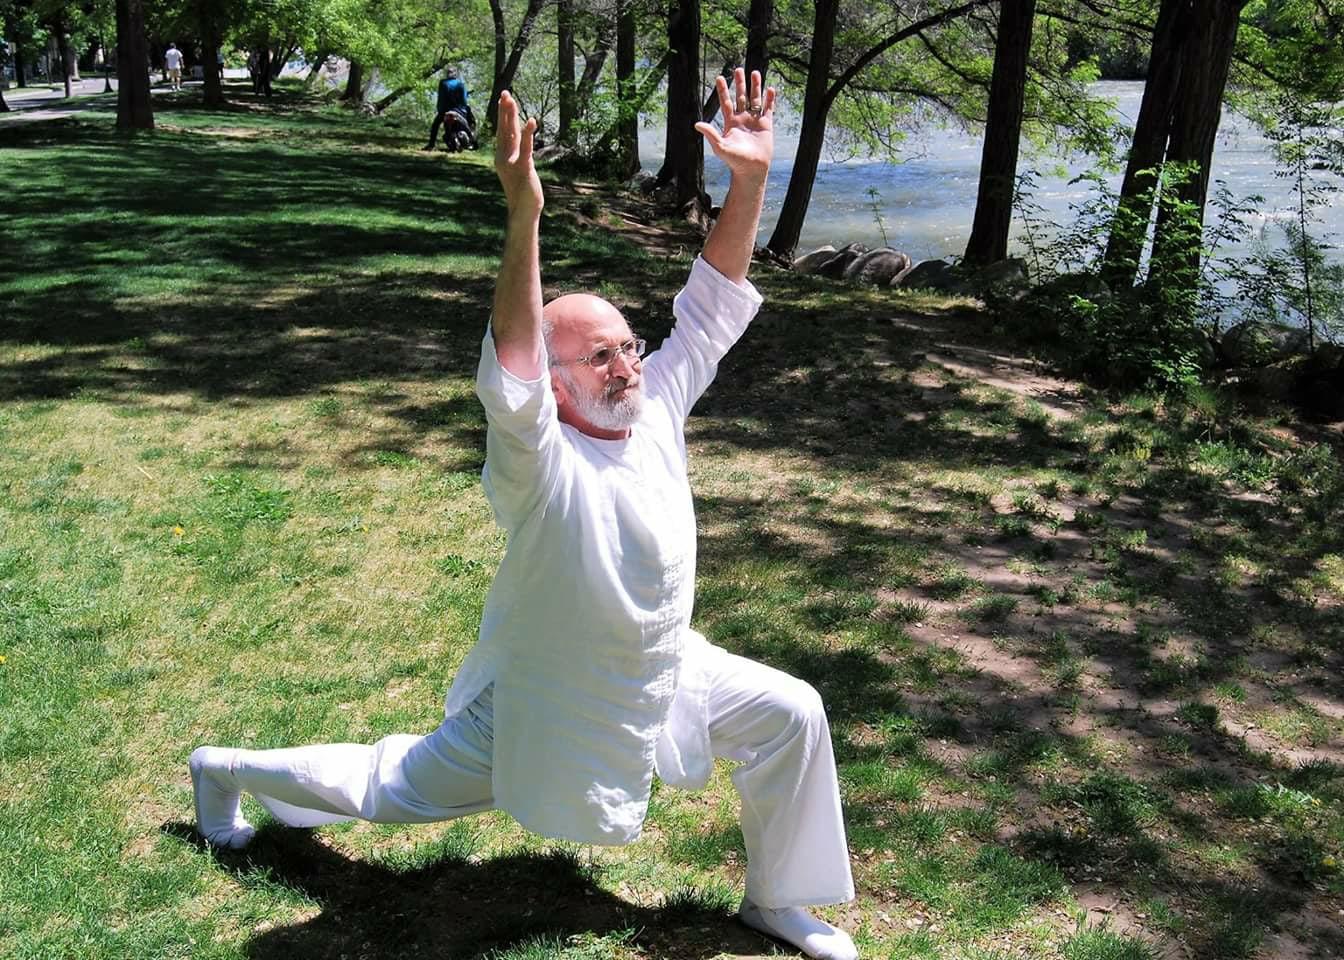 The Yoga Center Reno S Programs For Veterans Home